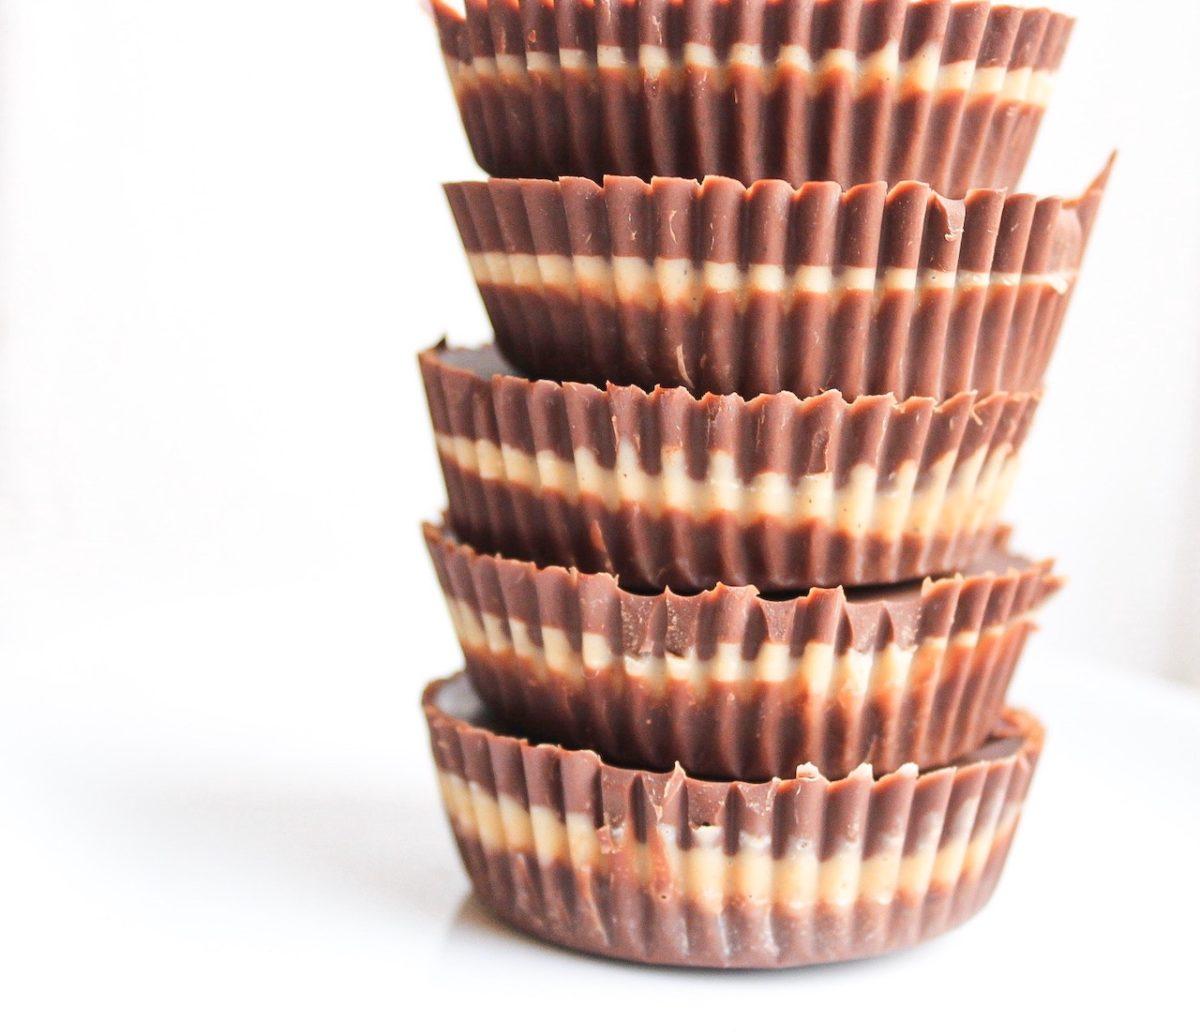 Almond Butter Cups